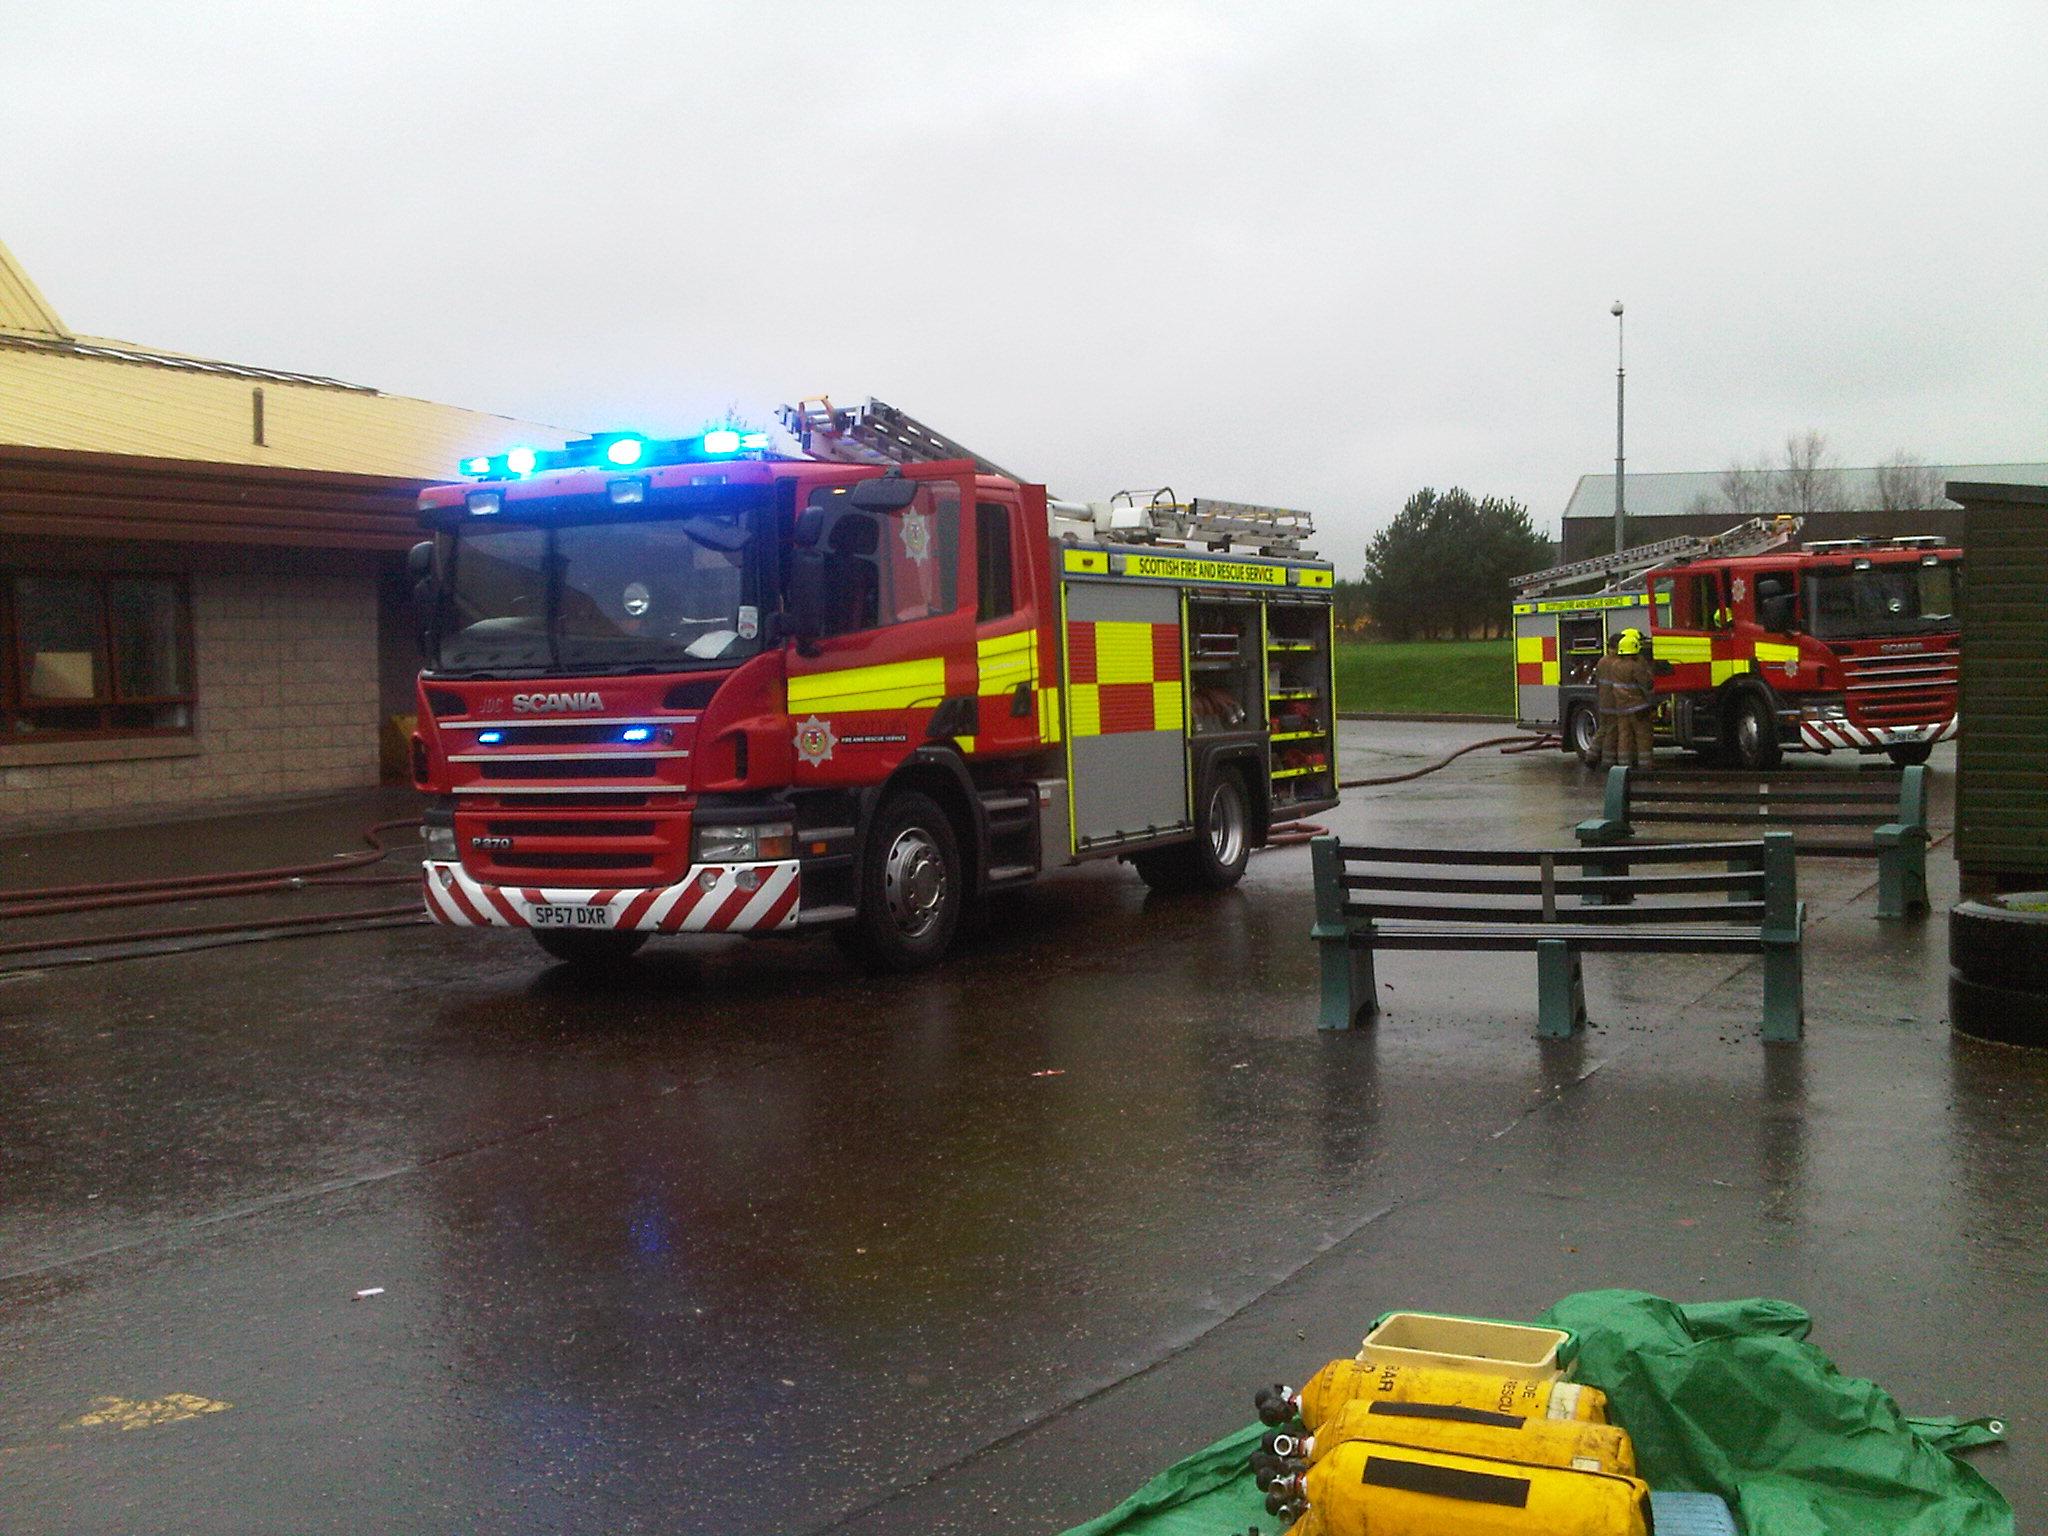 Crews still at scene following Brechin primary school fire